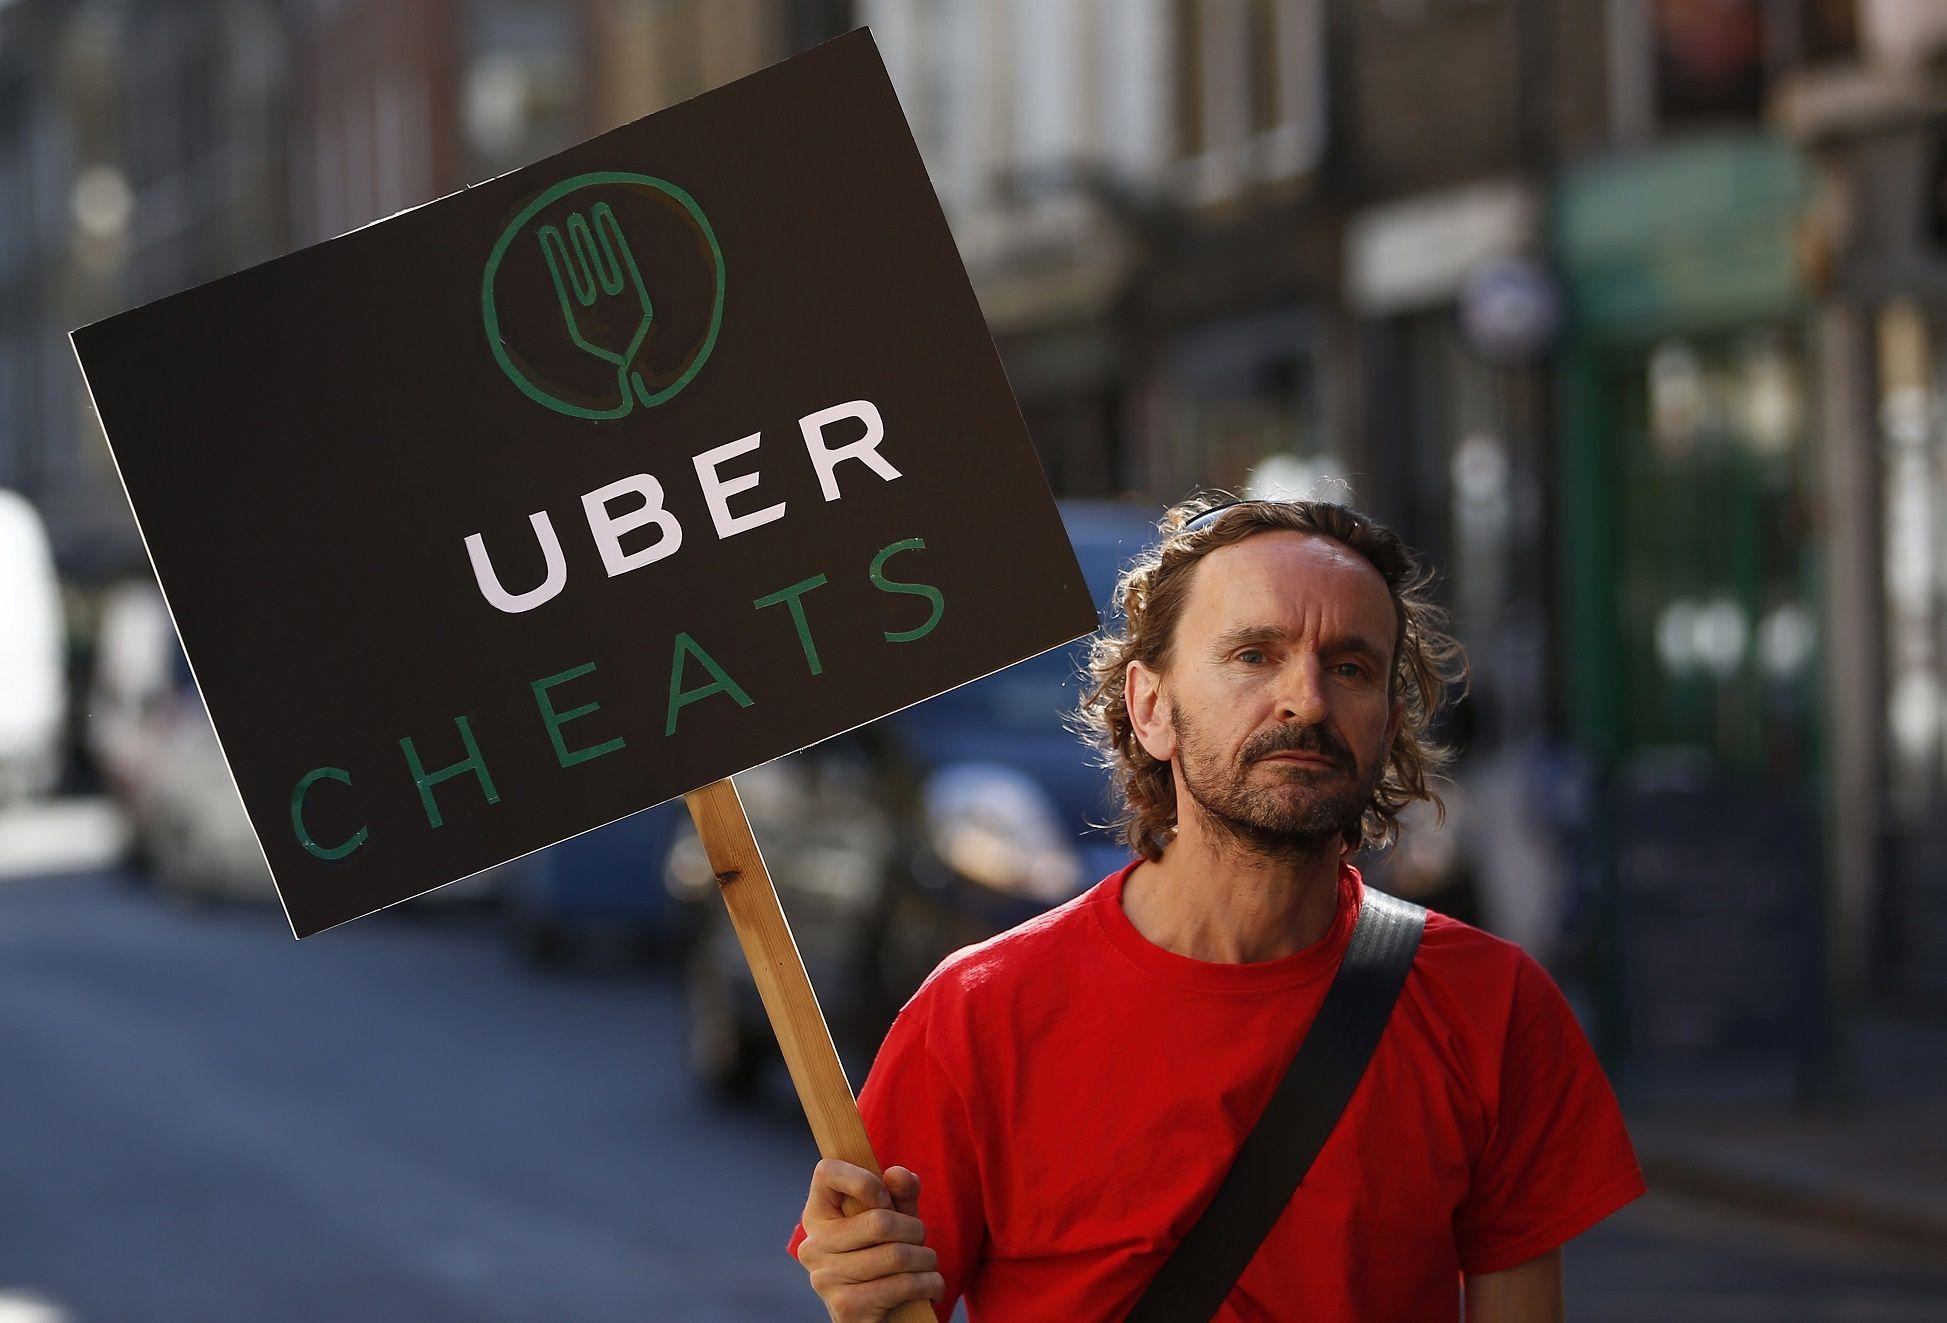 Uber strike protest minimum wage